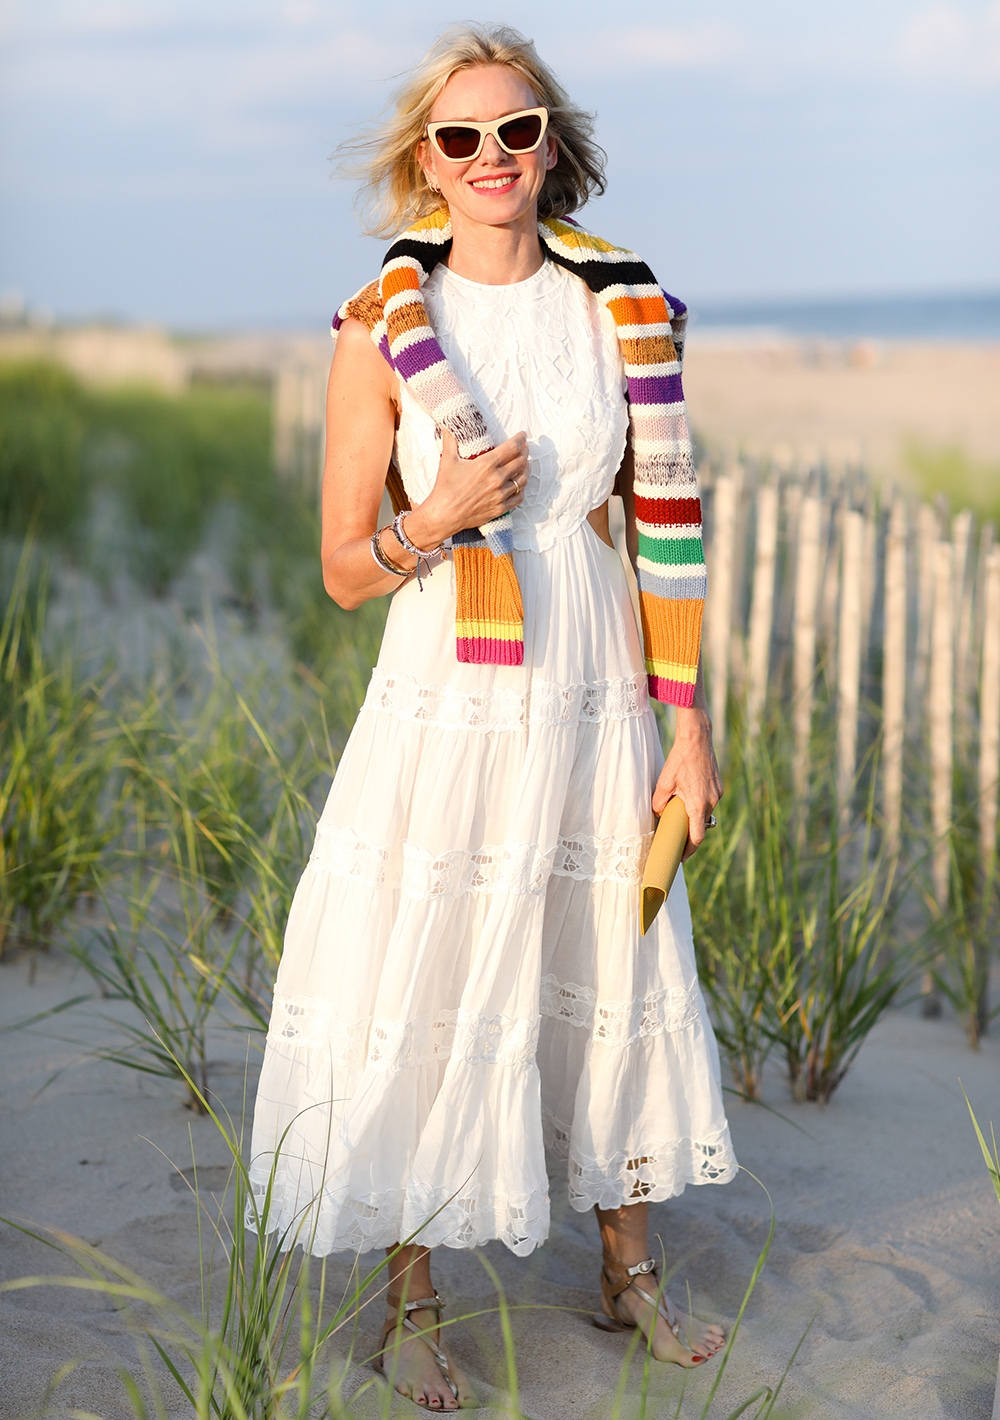 Naomi Watts at our Hamptons Summer Dinner